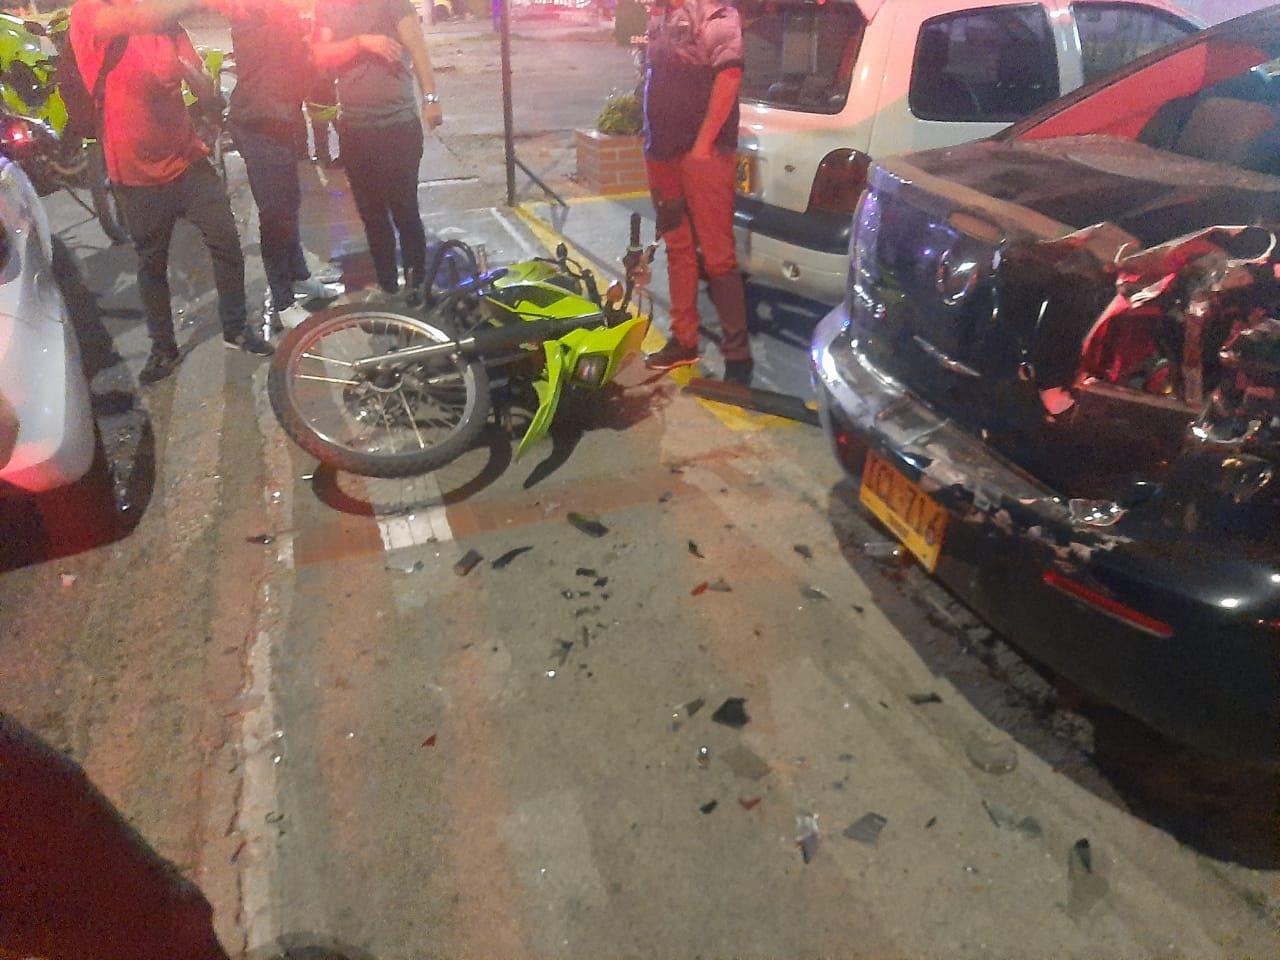 Borracho al volante atropelló a Policia en la Ambalá 4